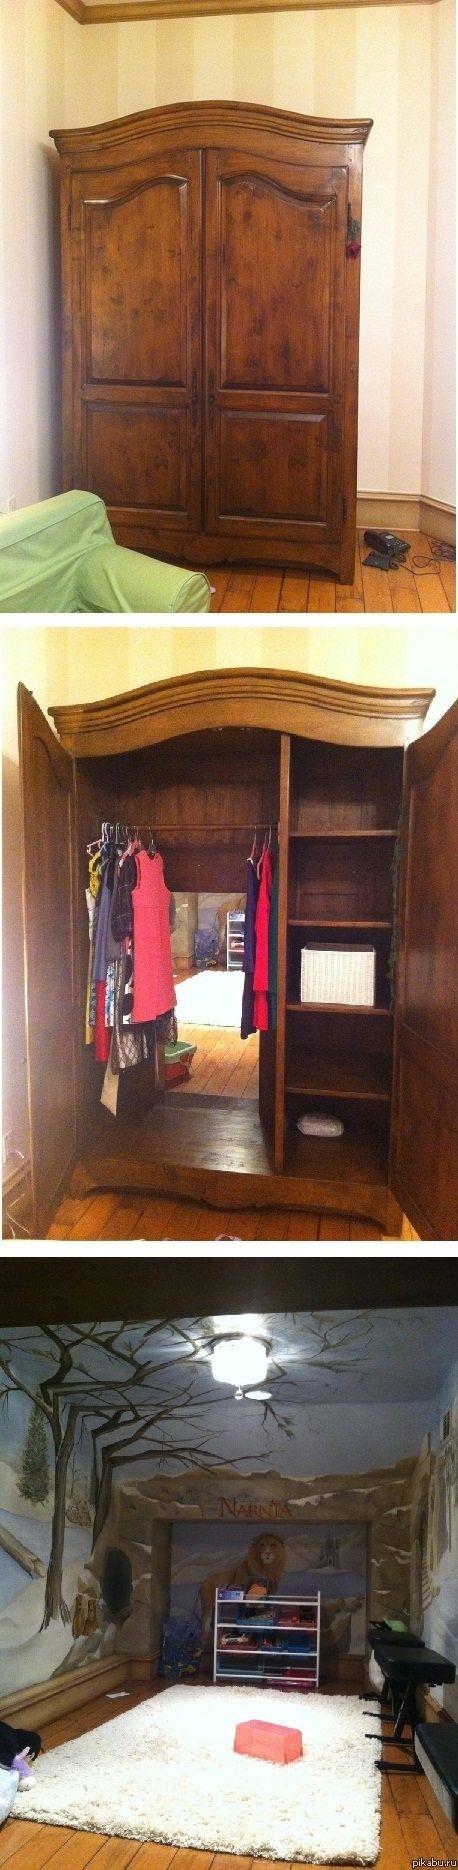 Narnia room!